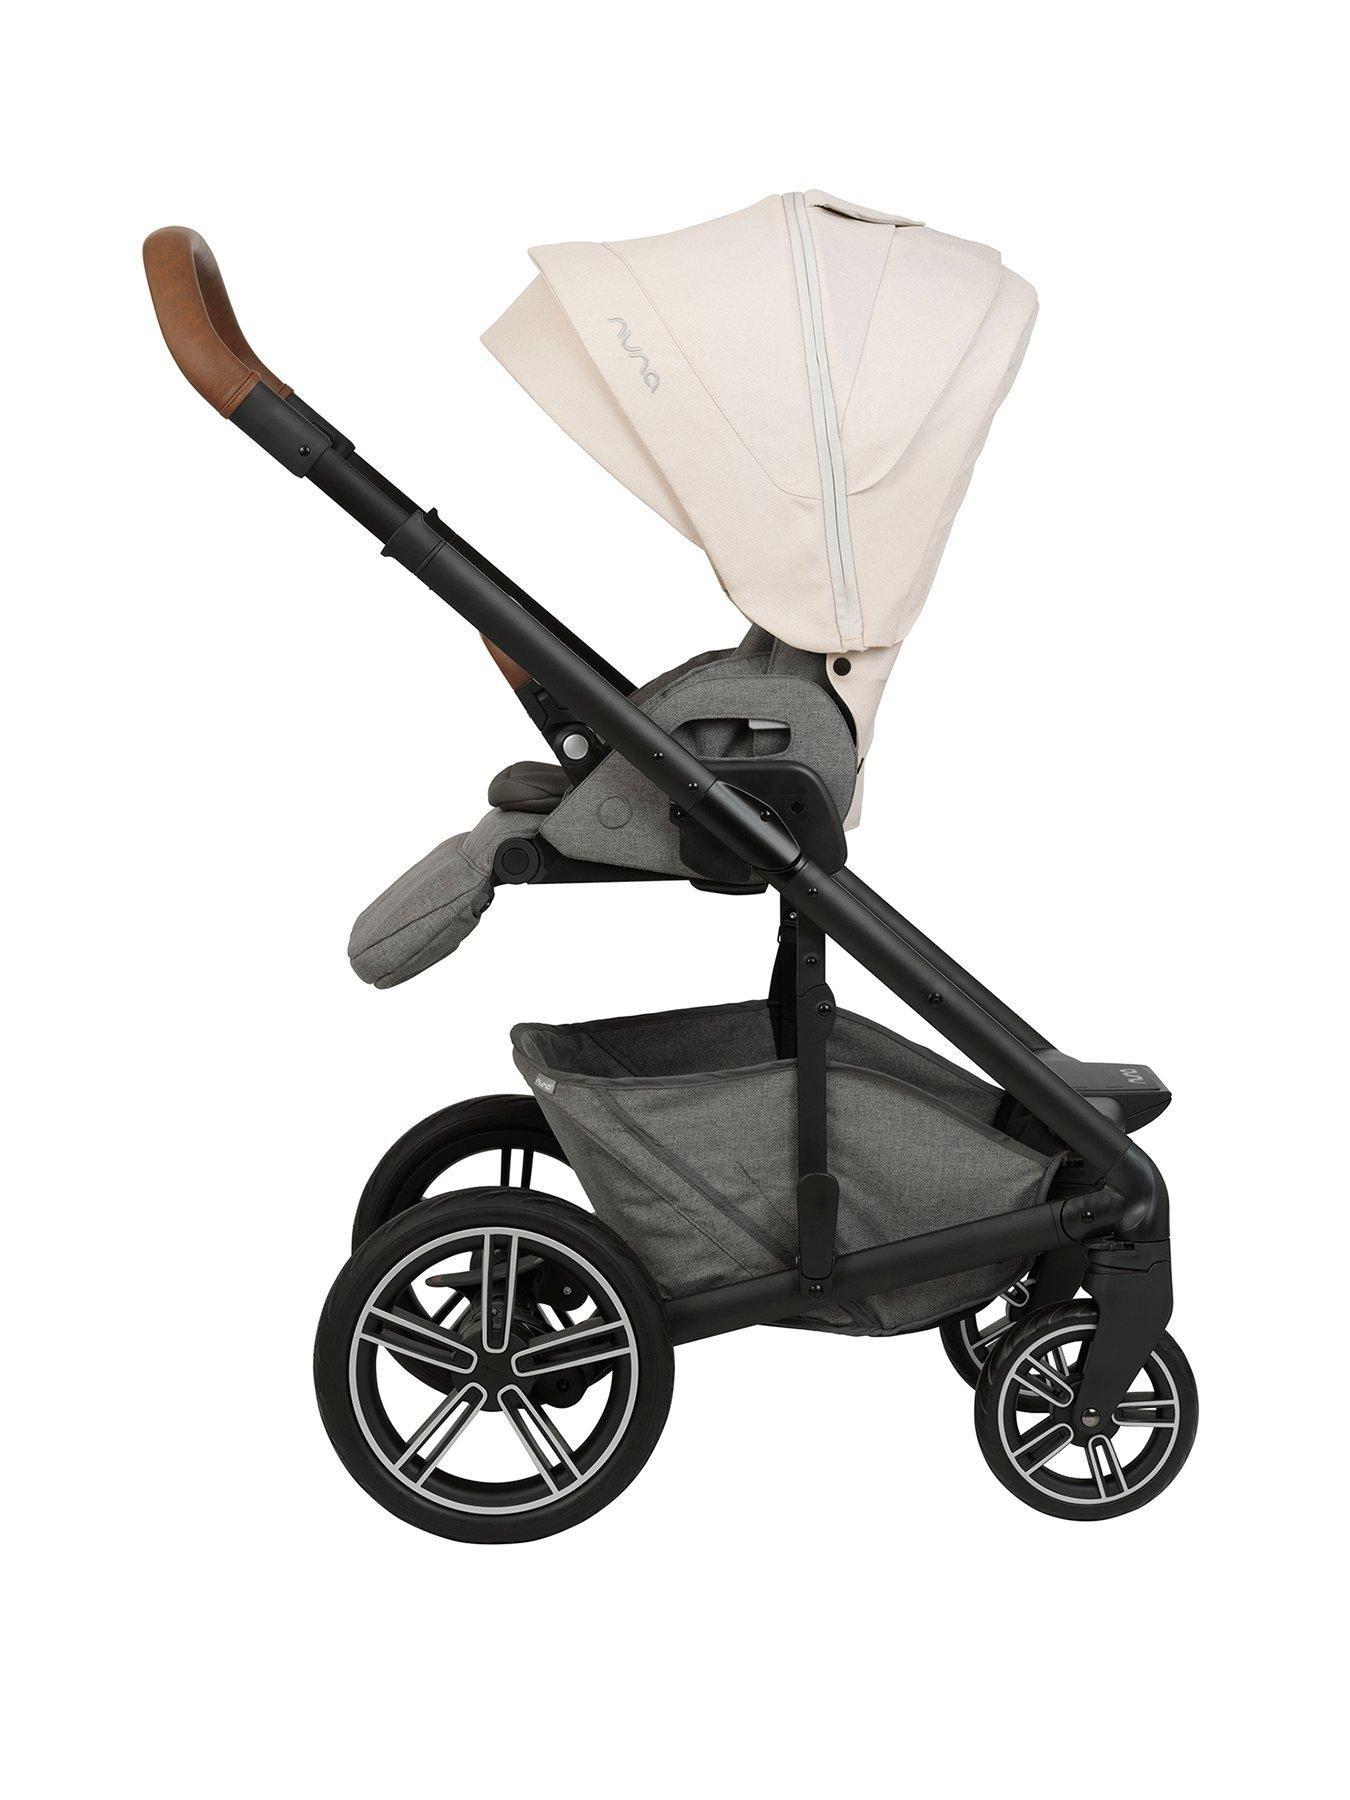 Mixx Stroller Birch in 2020 Nuna mixx stroller, Nuna